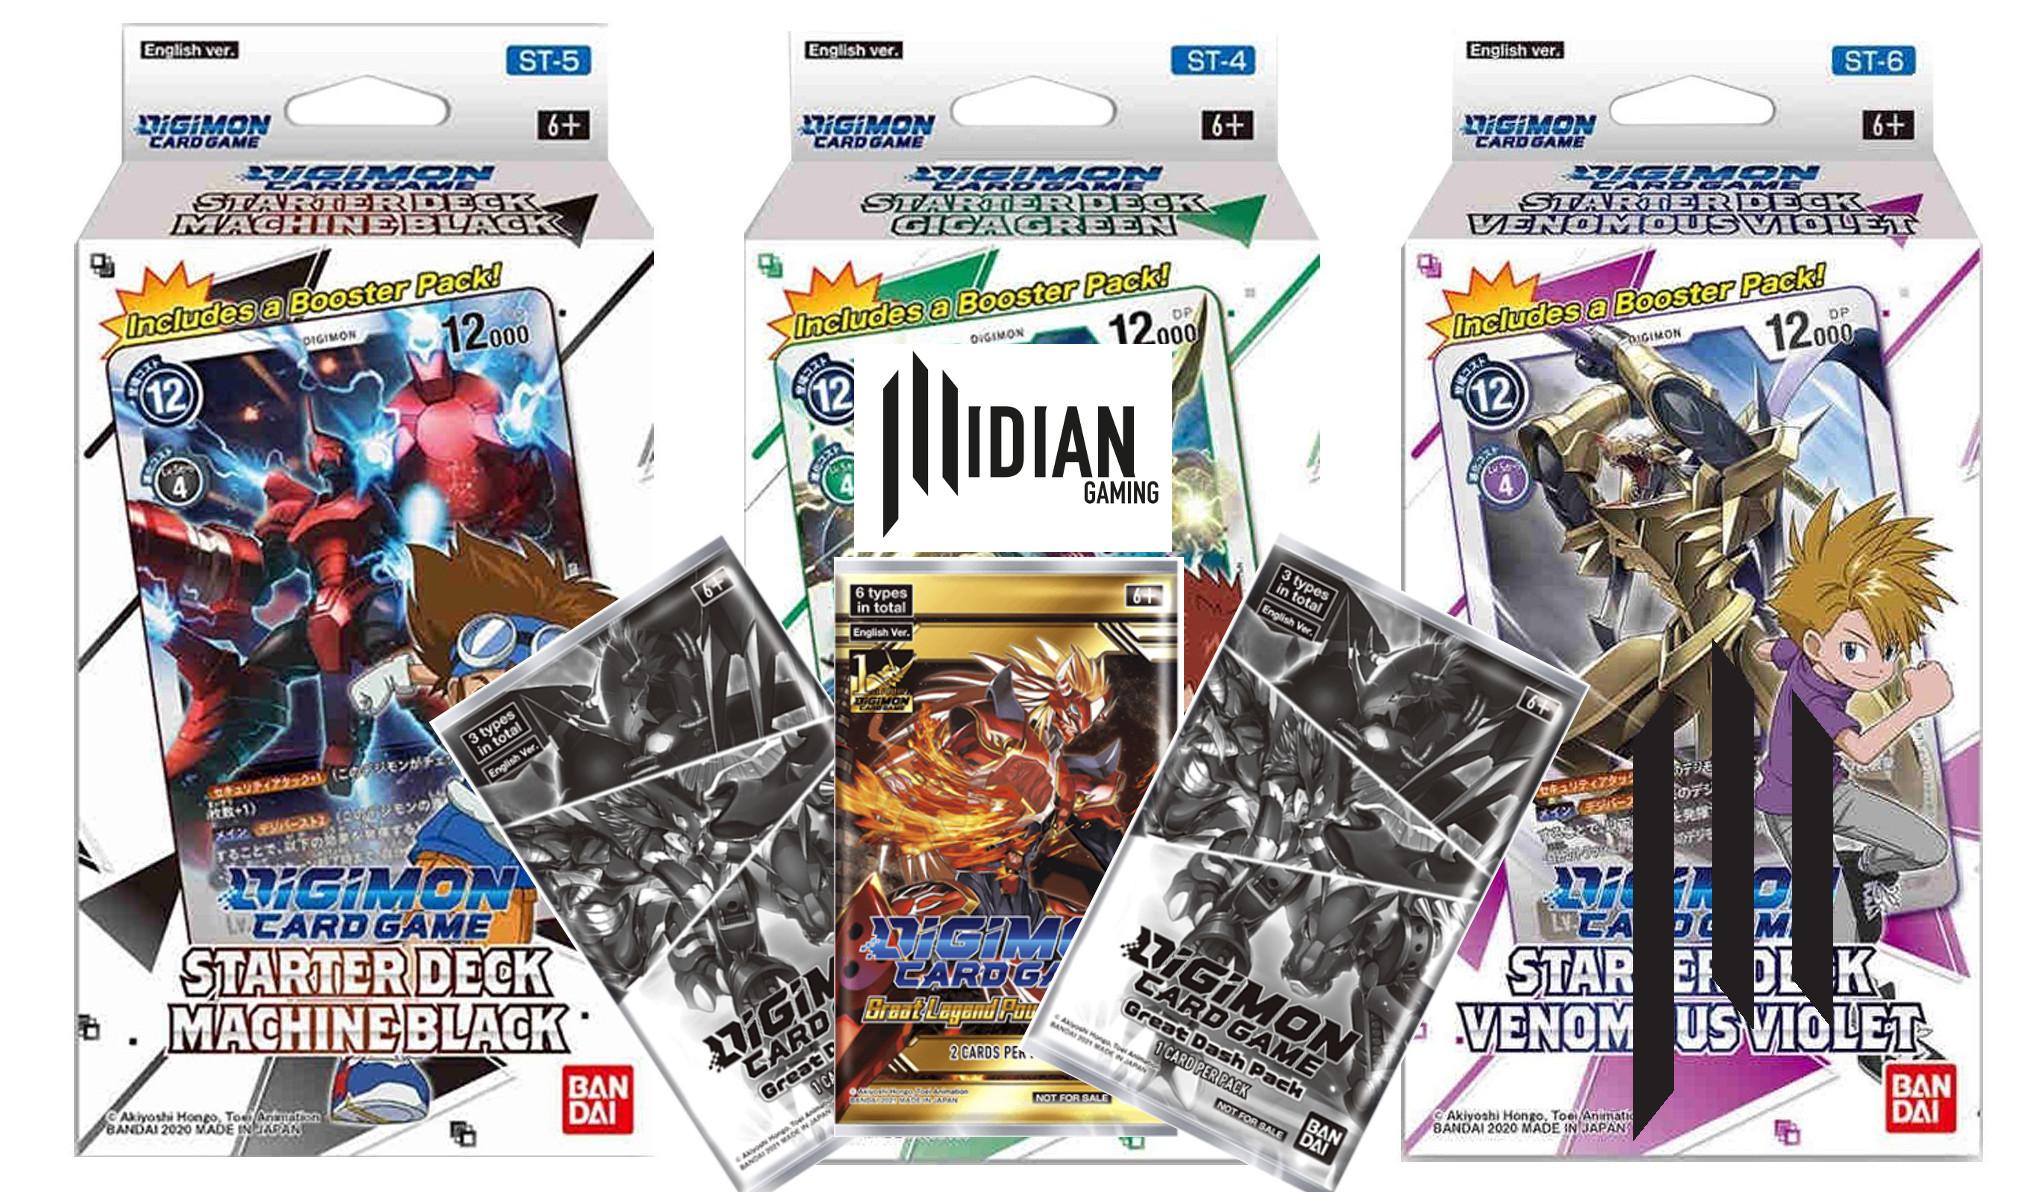 Best Online Game Shop in Australia - Midian Gaming